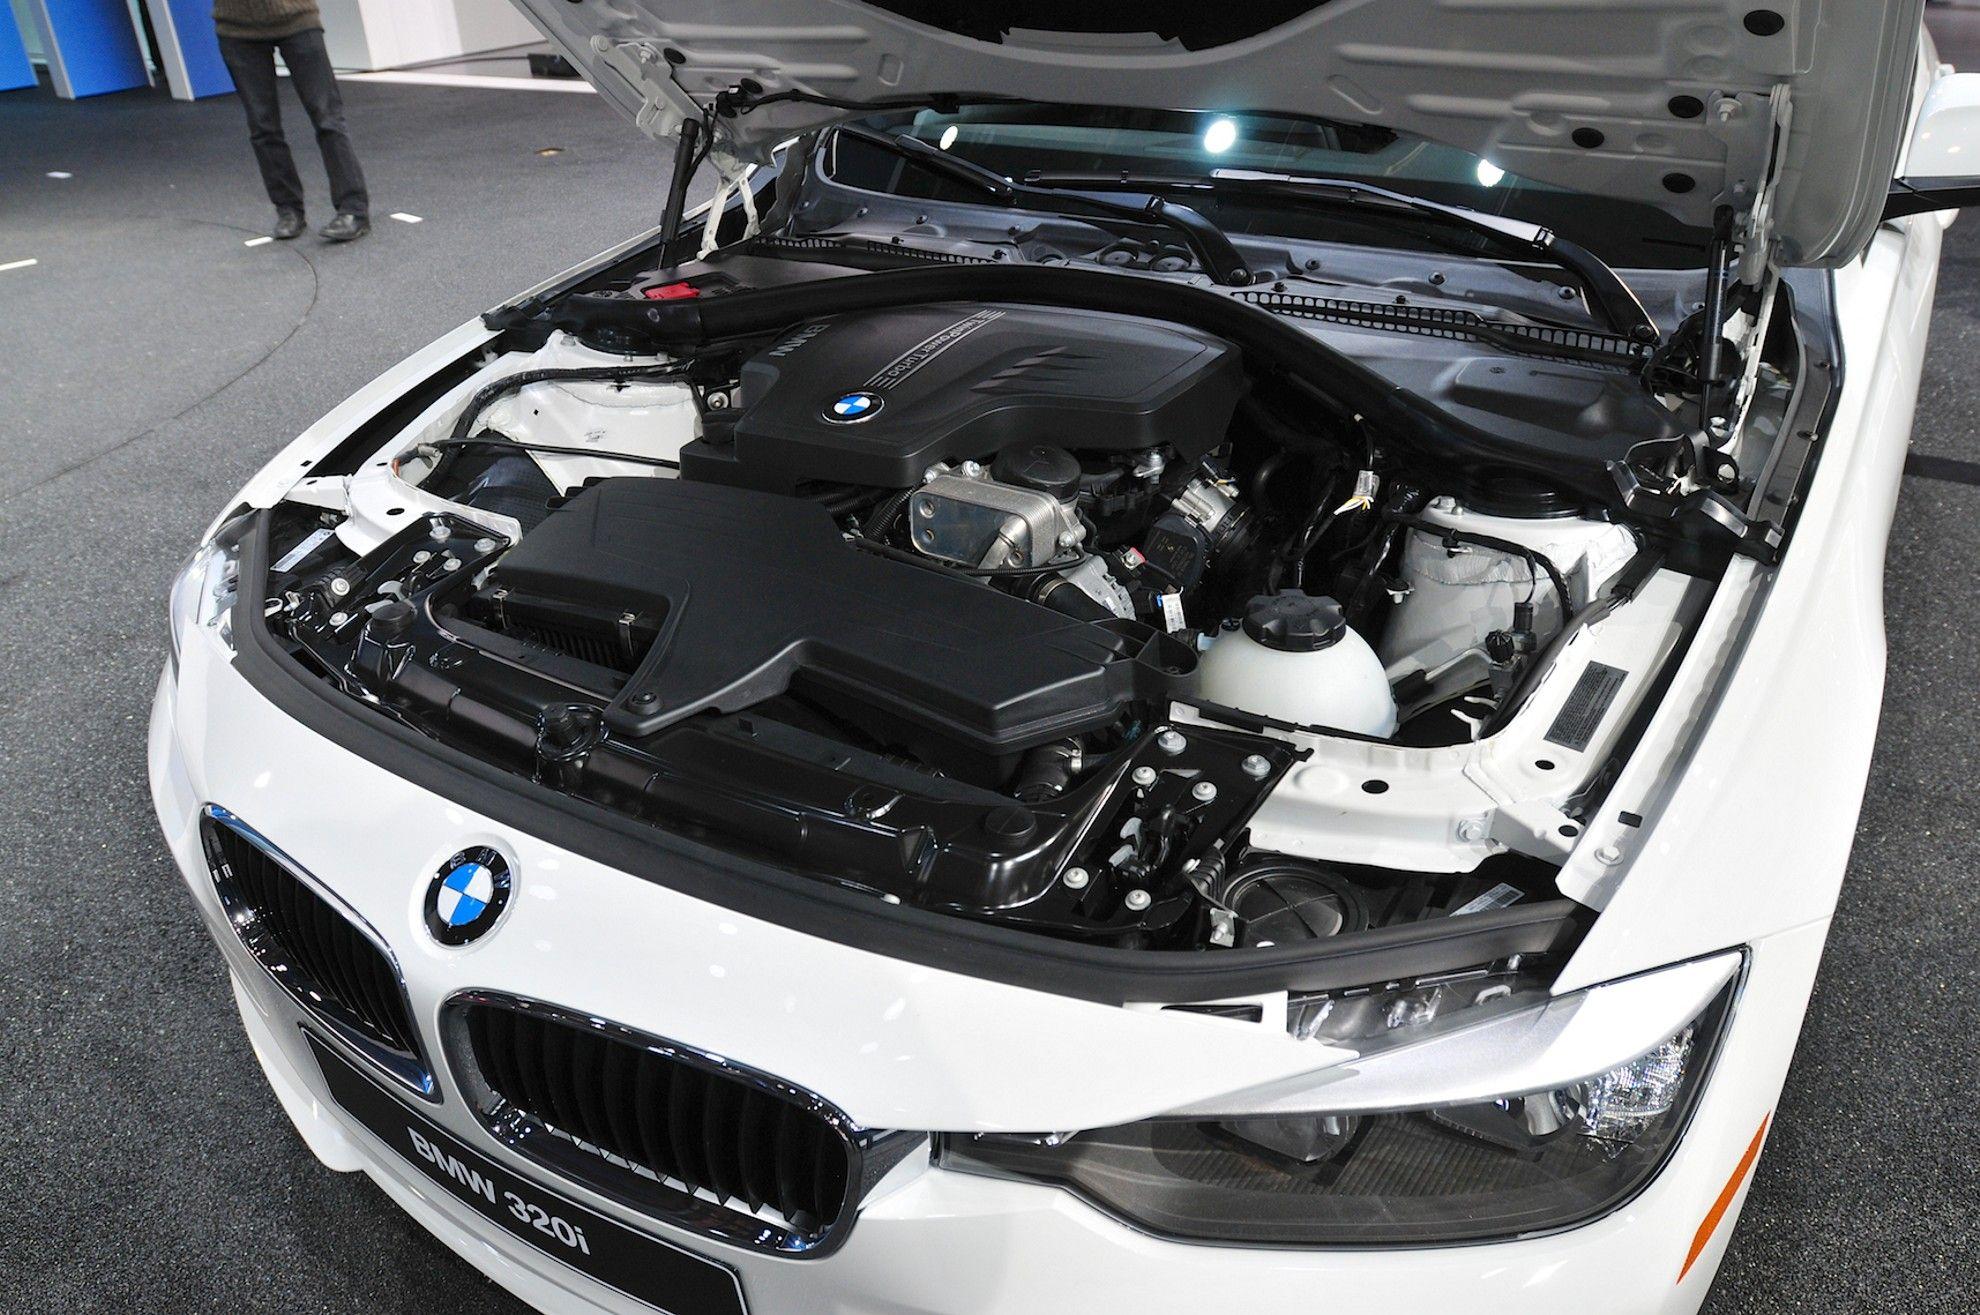 2013 BUSINESSCAR AWARDS - BMW 3-series | Bmw, Car repair ...